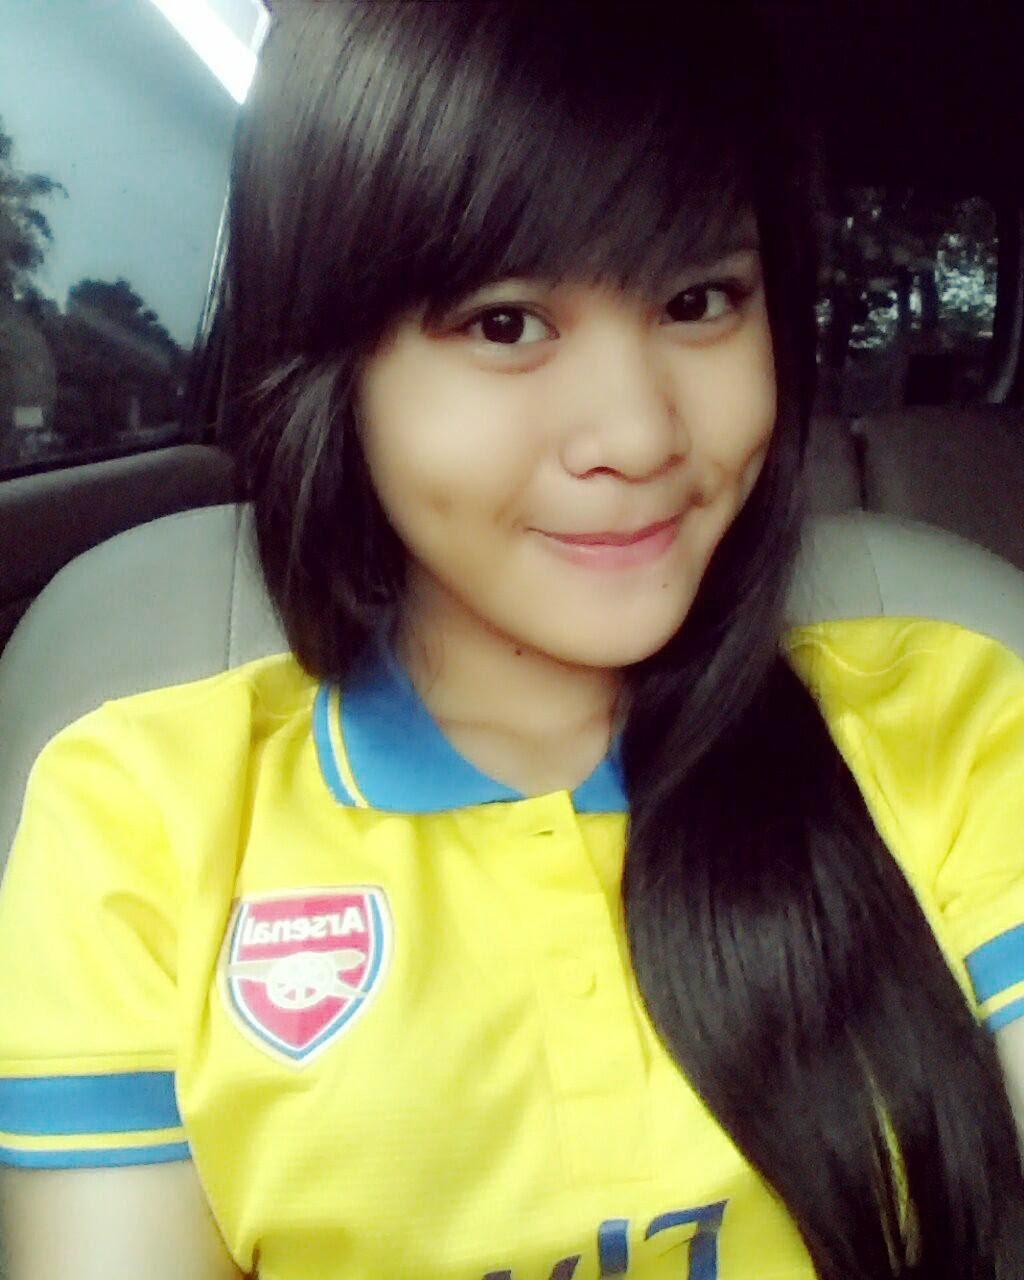 Foto Cantik Delima Rizky JKT48 Pakai Jersey Bola Arsenal